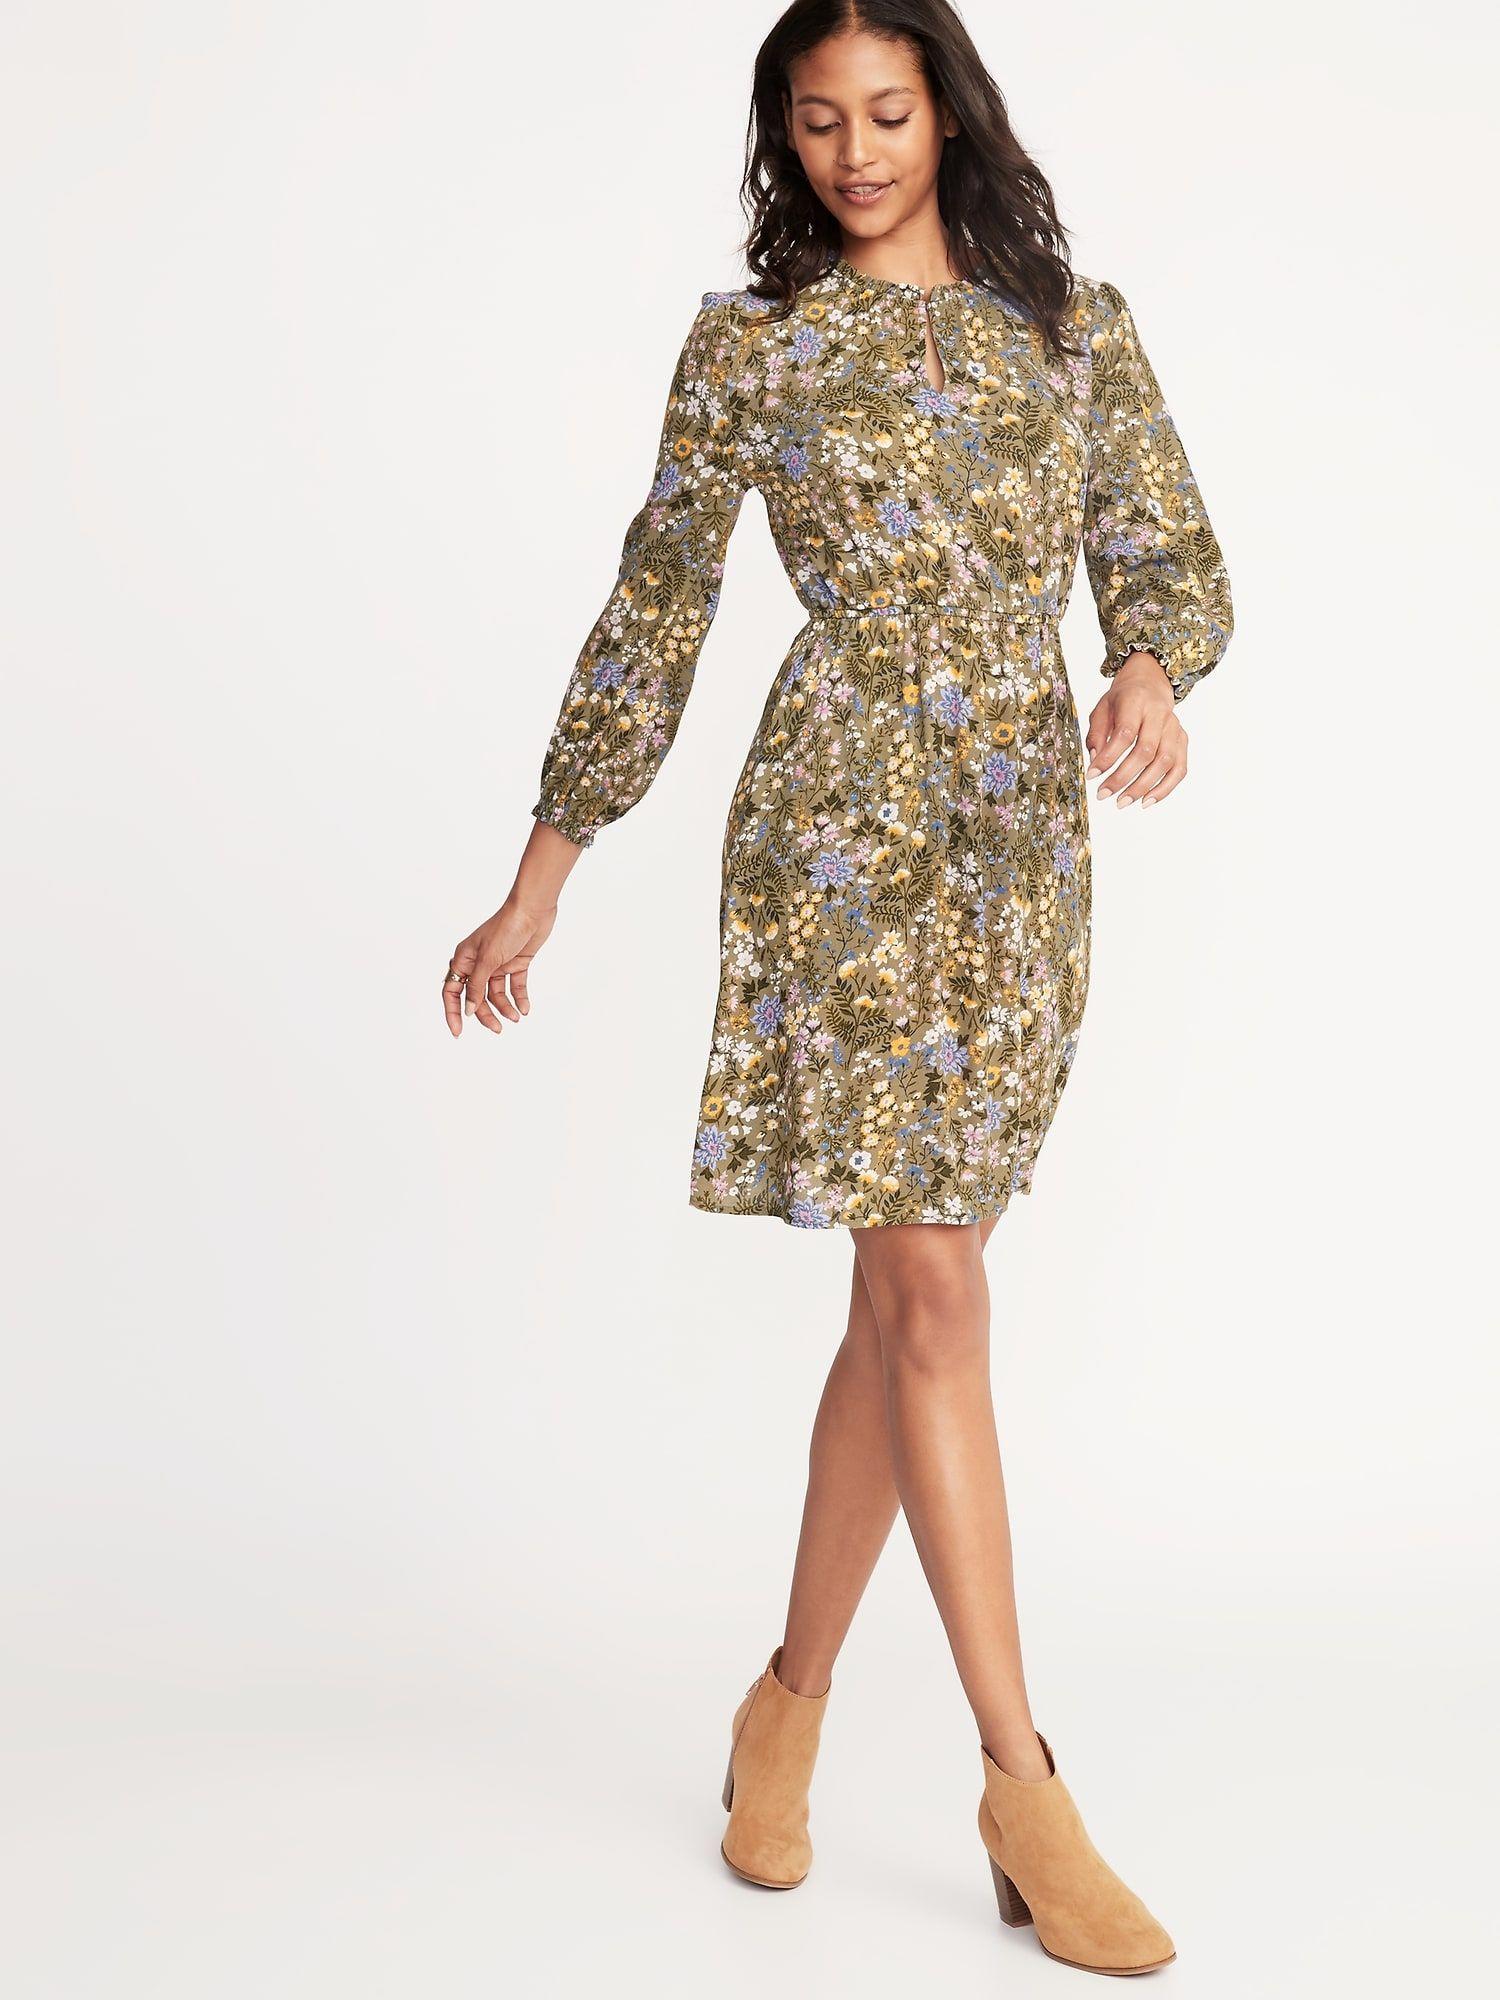 3c348a9537e Waist-Defined Ruffle-Trim Dress for Women | Old Navy | Stylin' in ...